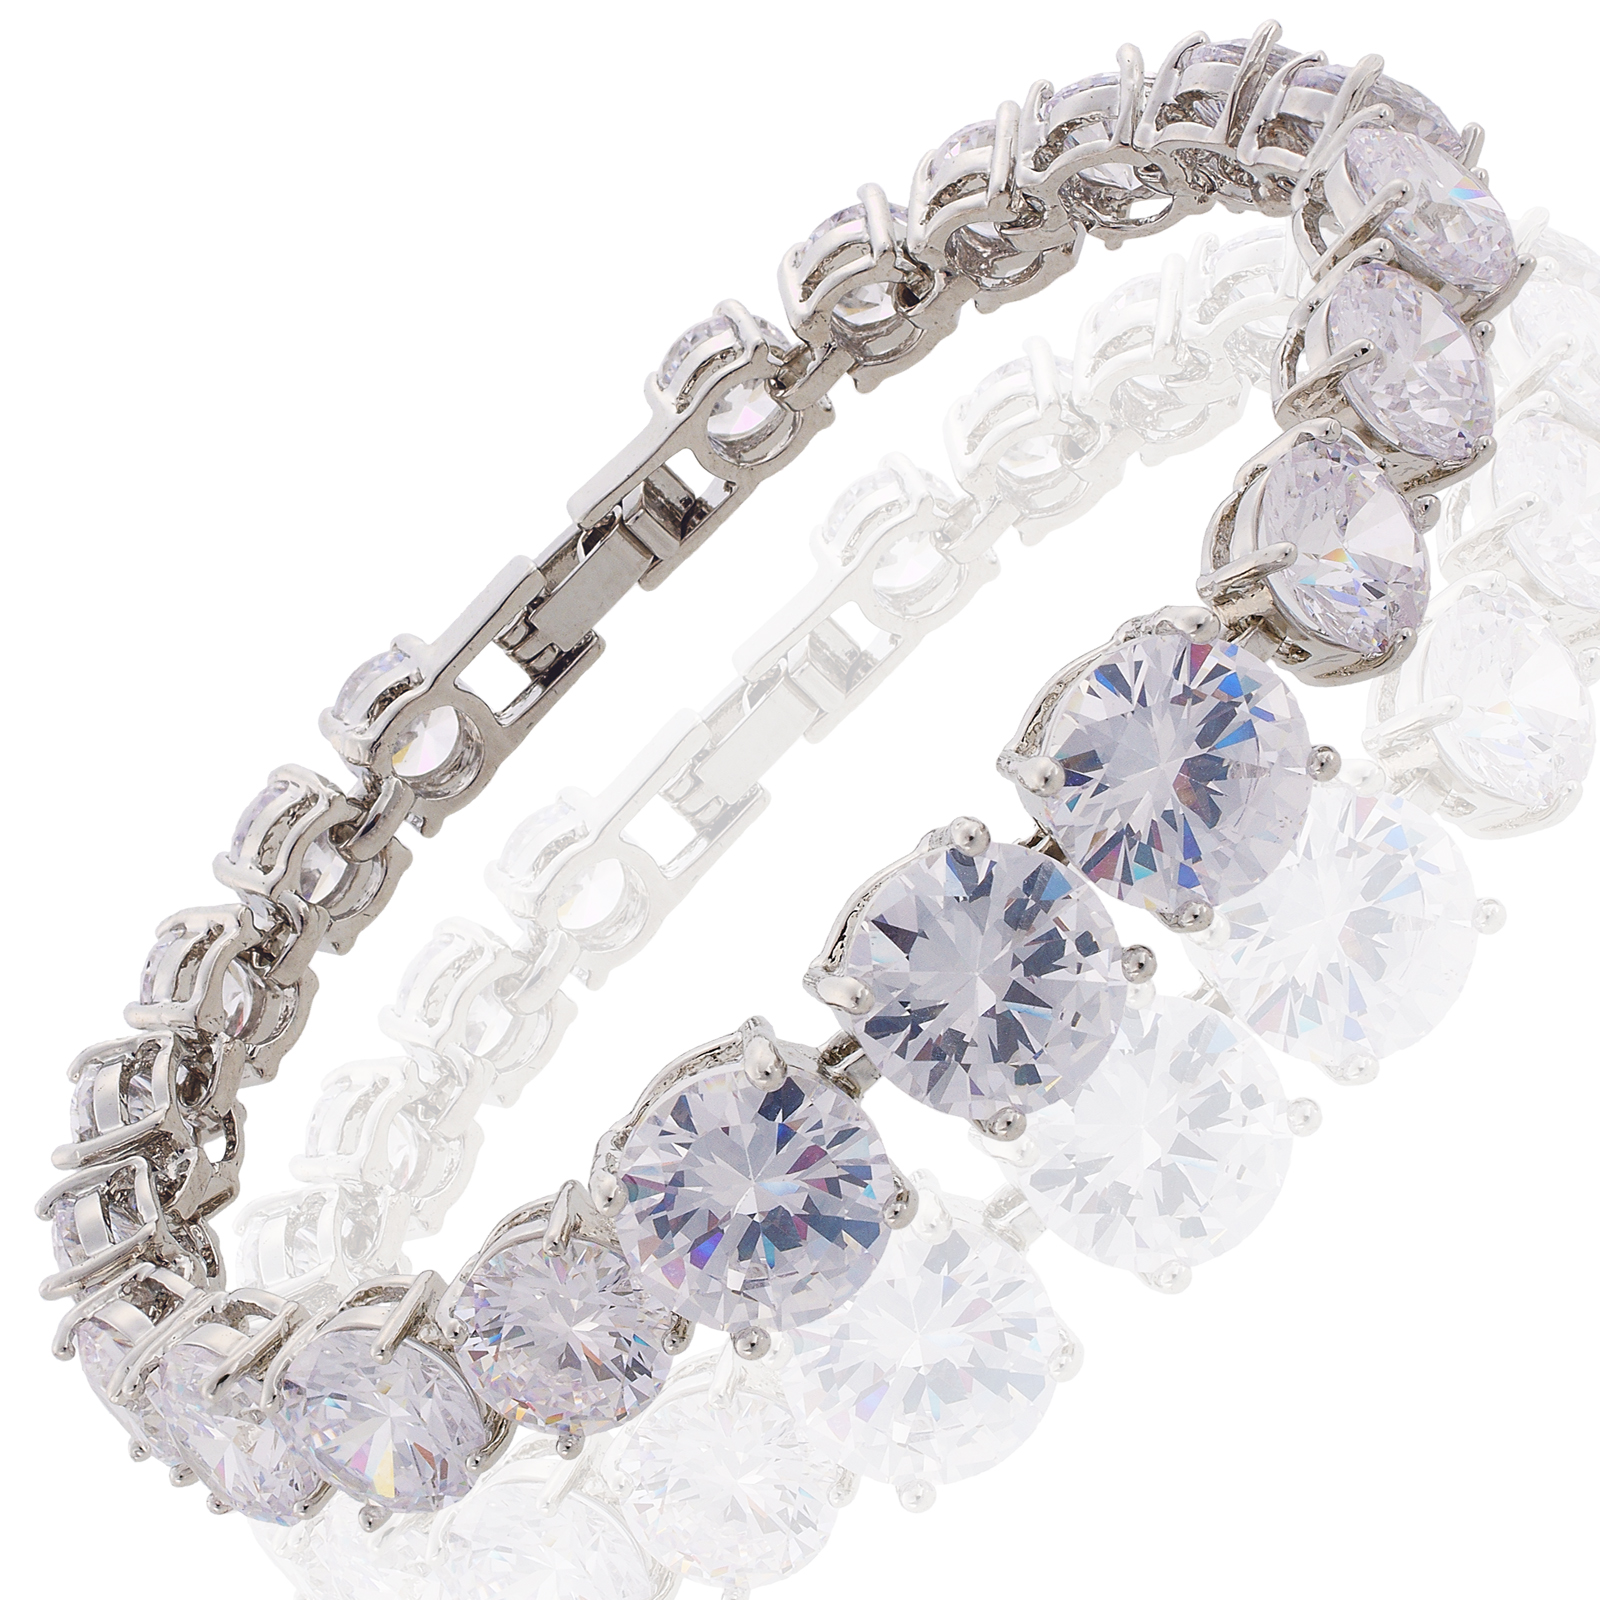 New Fashion Lady Gift 18 Carat Gold Plated Birthstone Tennis Bangle Bracelet   eBay